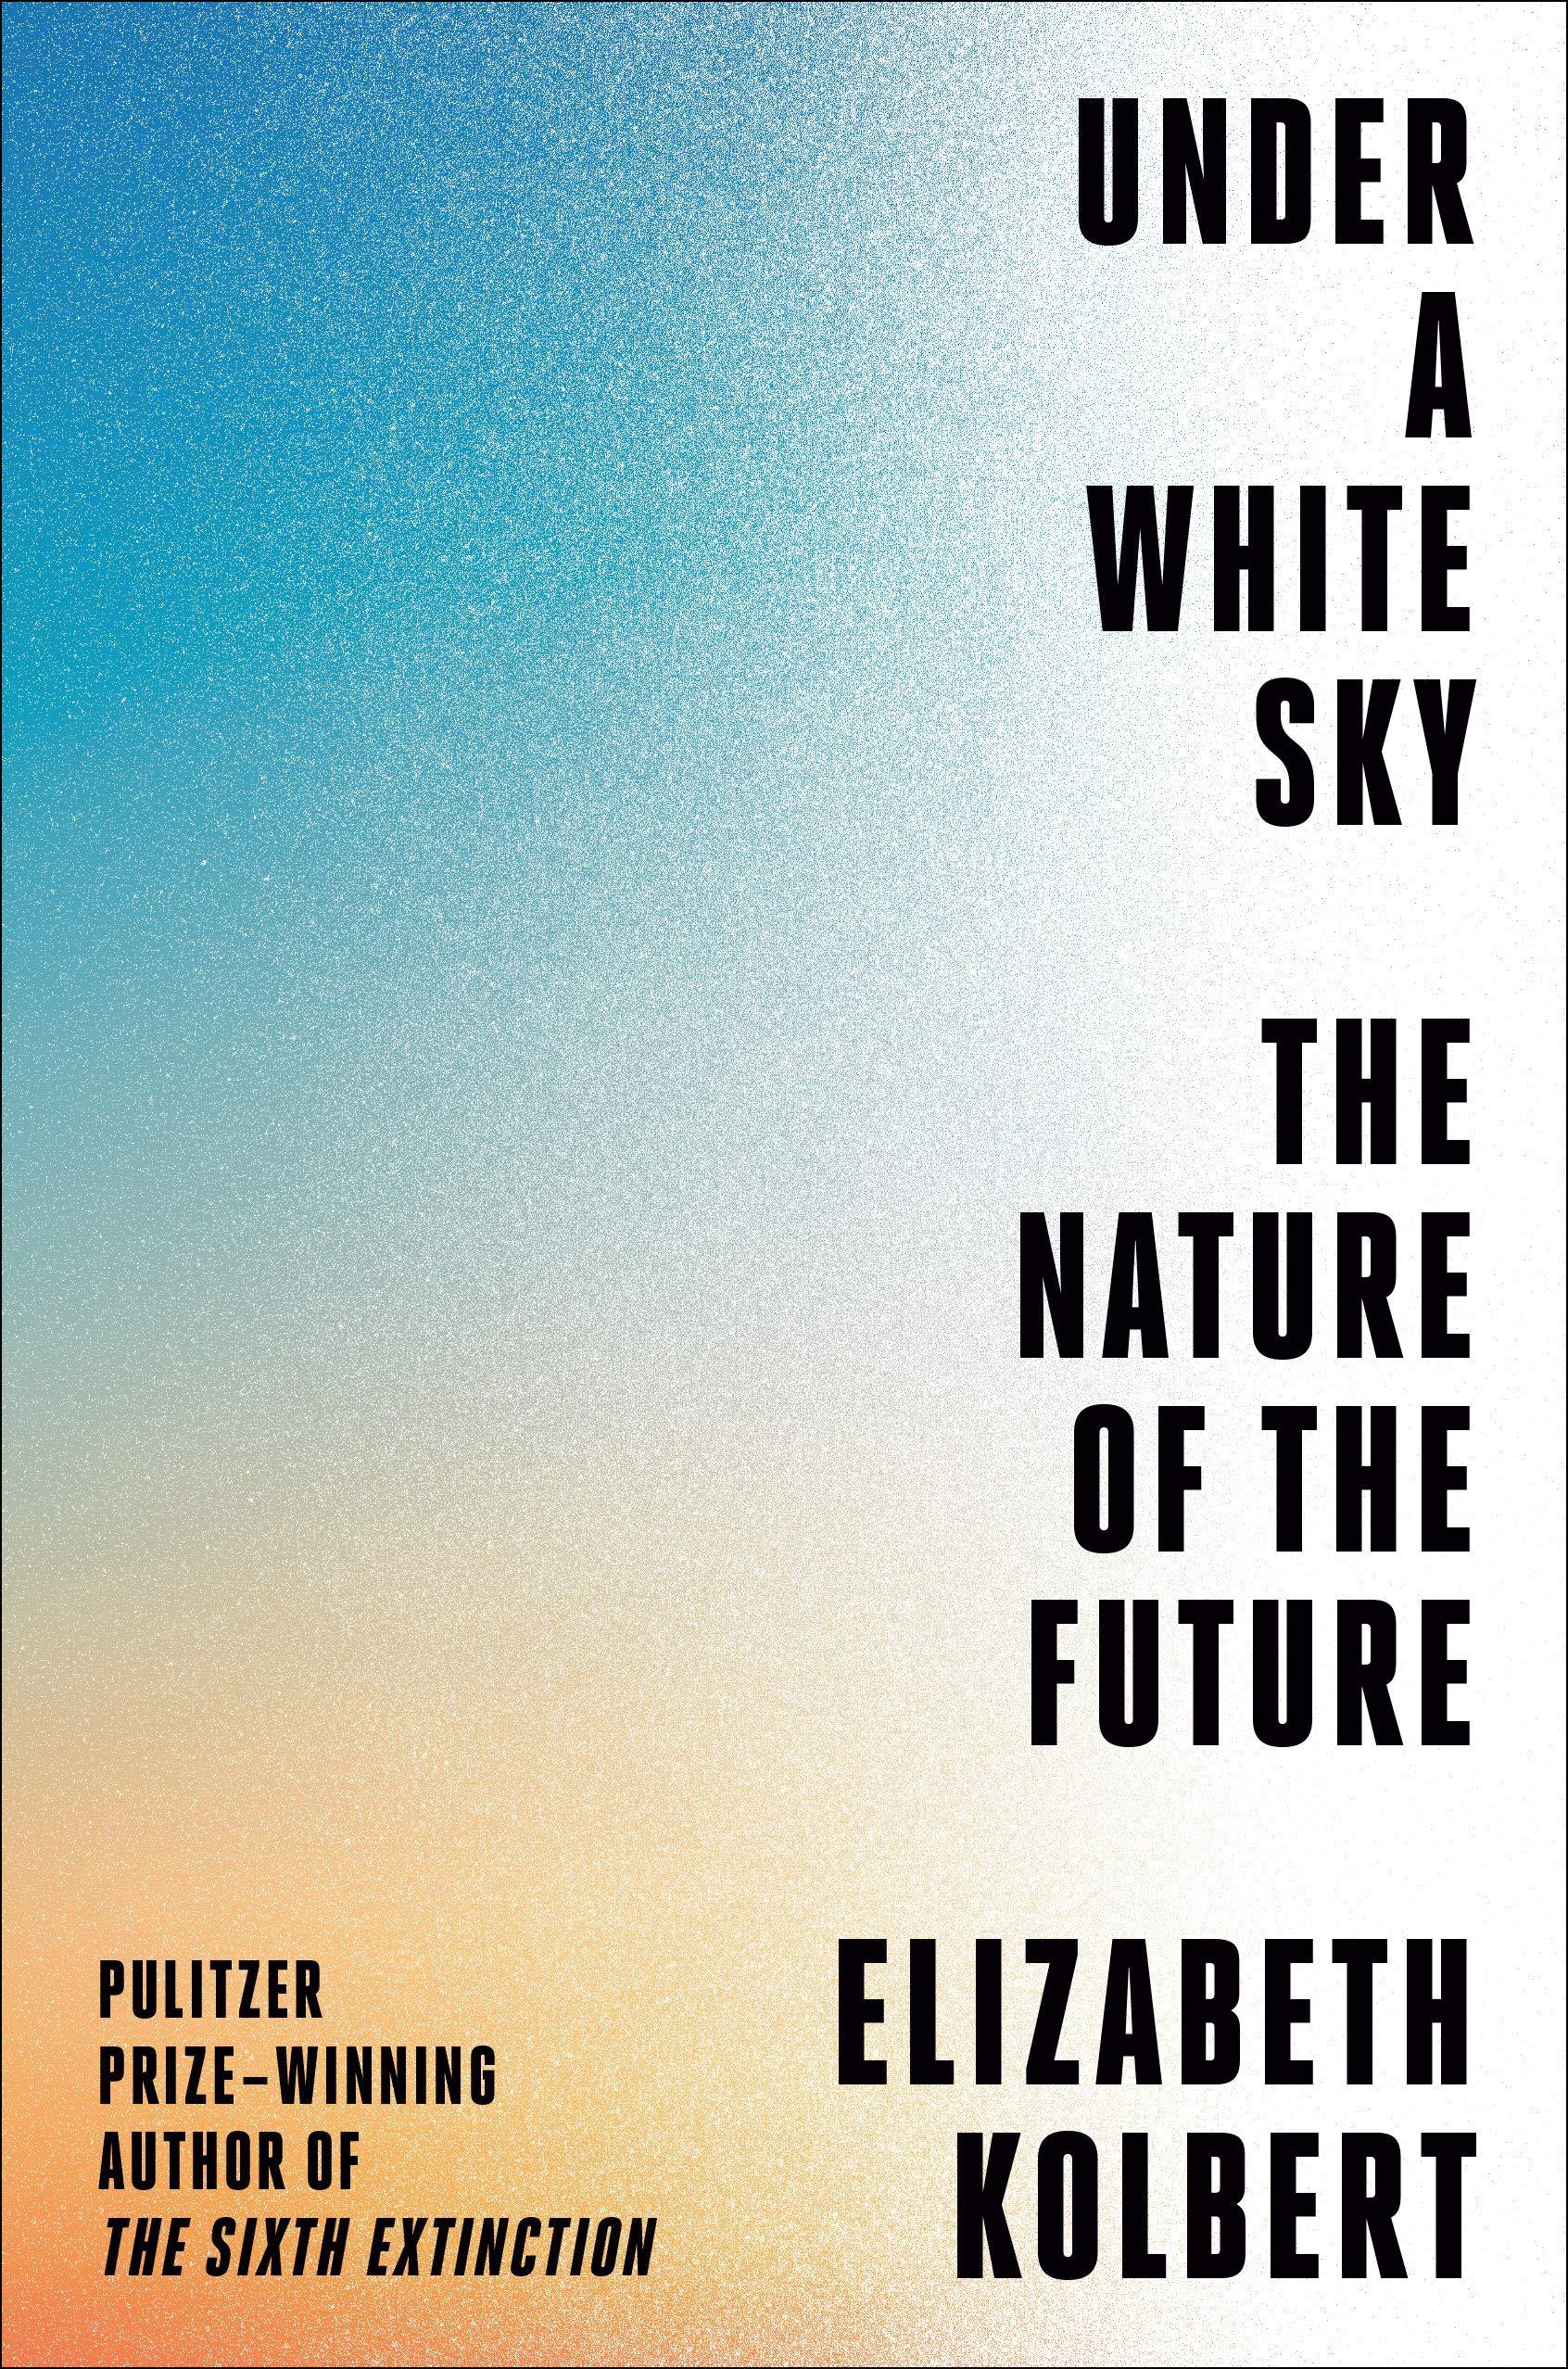 Under a White Sky: The Nature of the Future: Kolbert, Elizabeth:  9780593136270: Amazon.com: Books